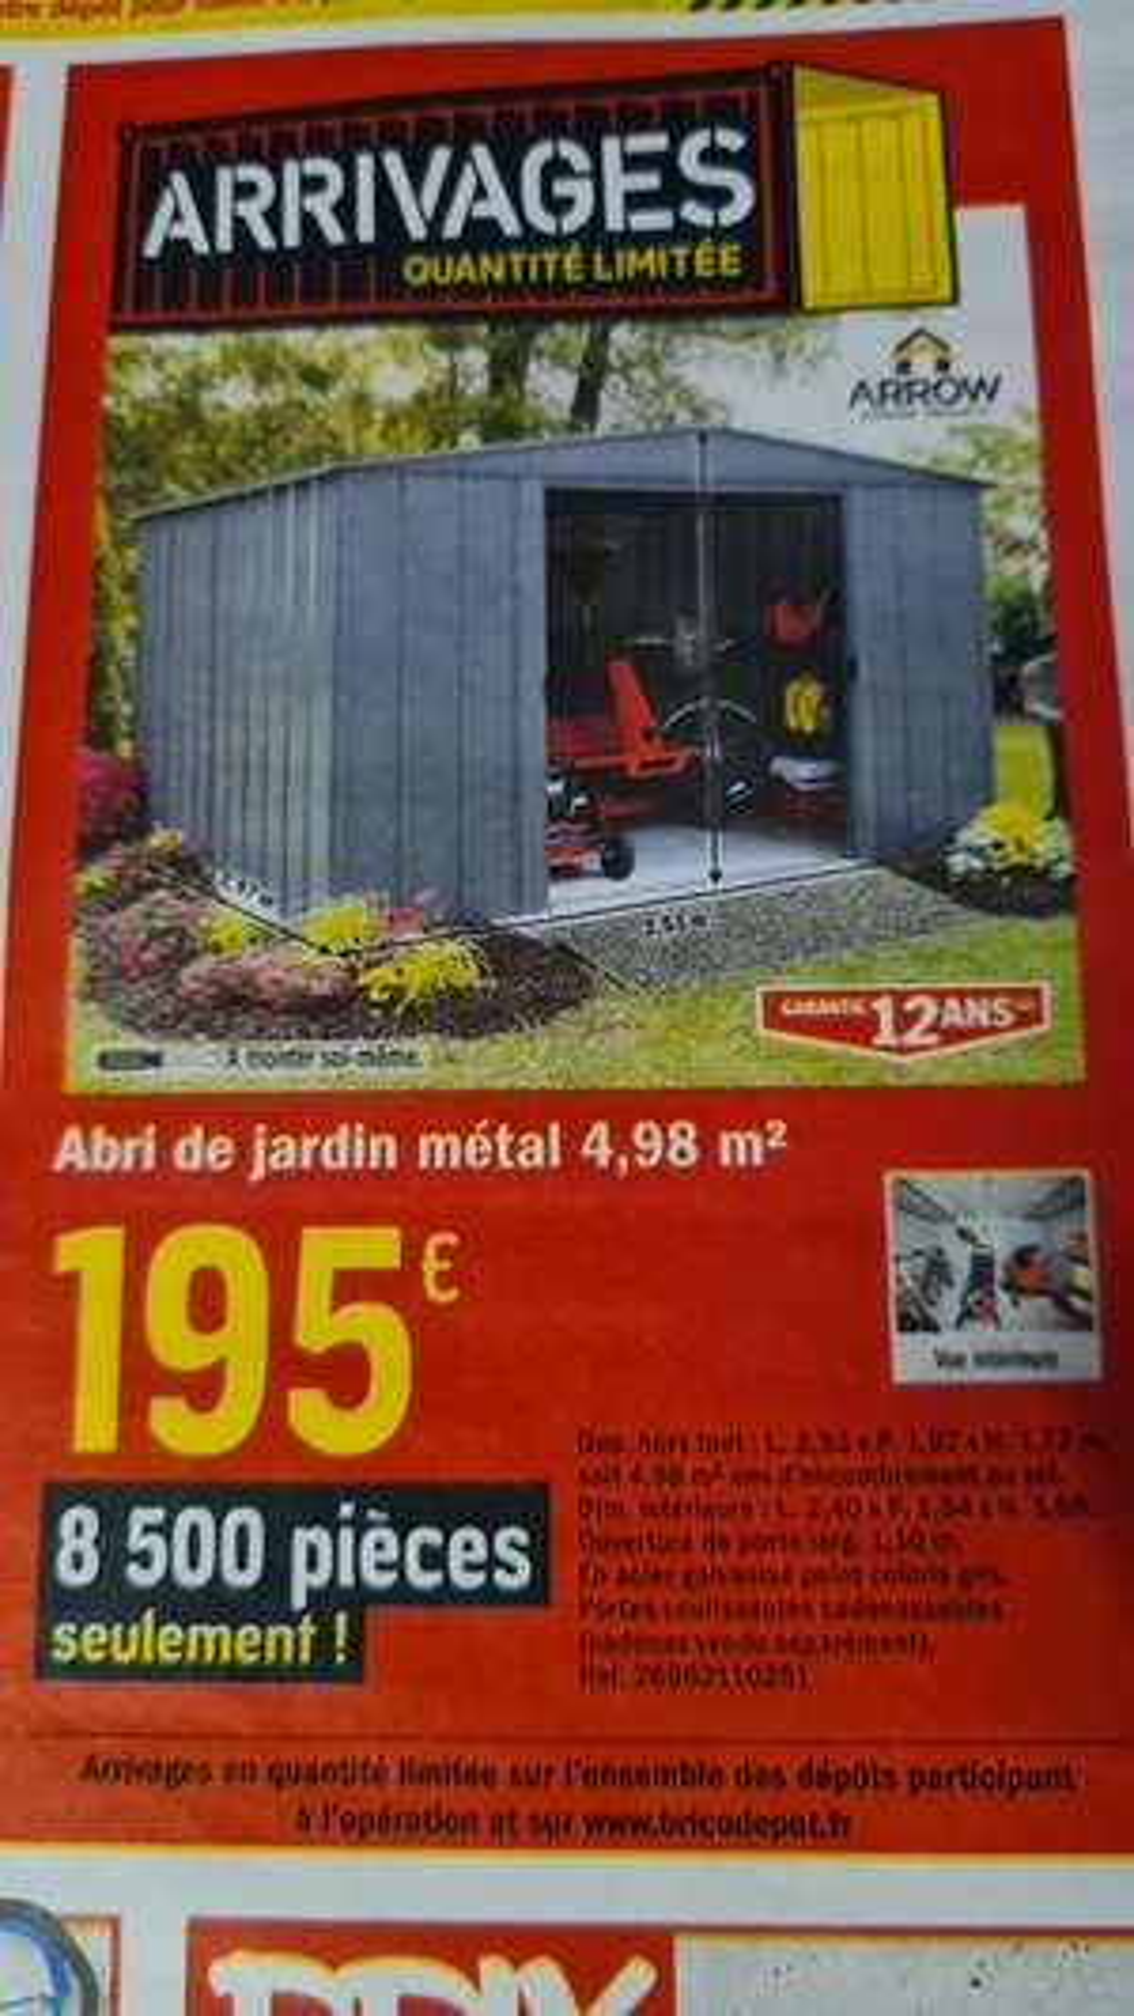 Abri de jardin en métal Arrow - 4,98m2